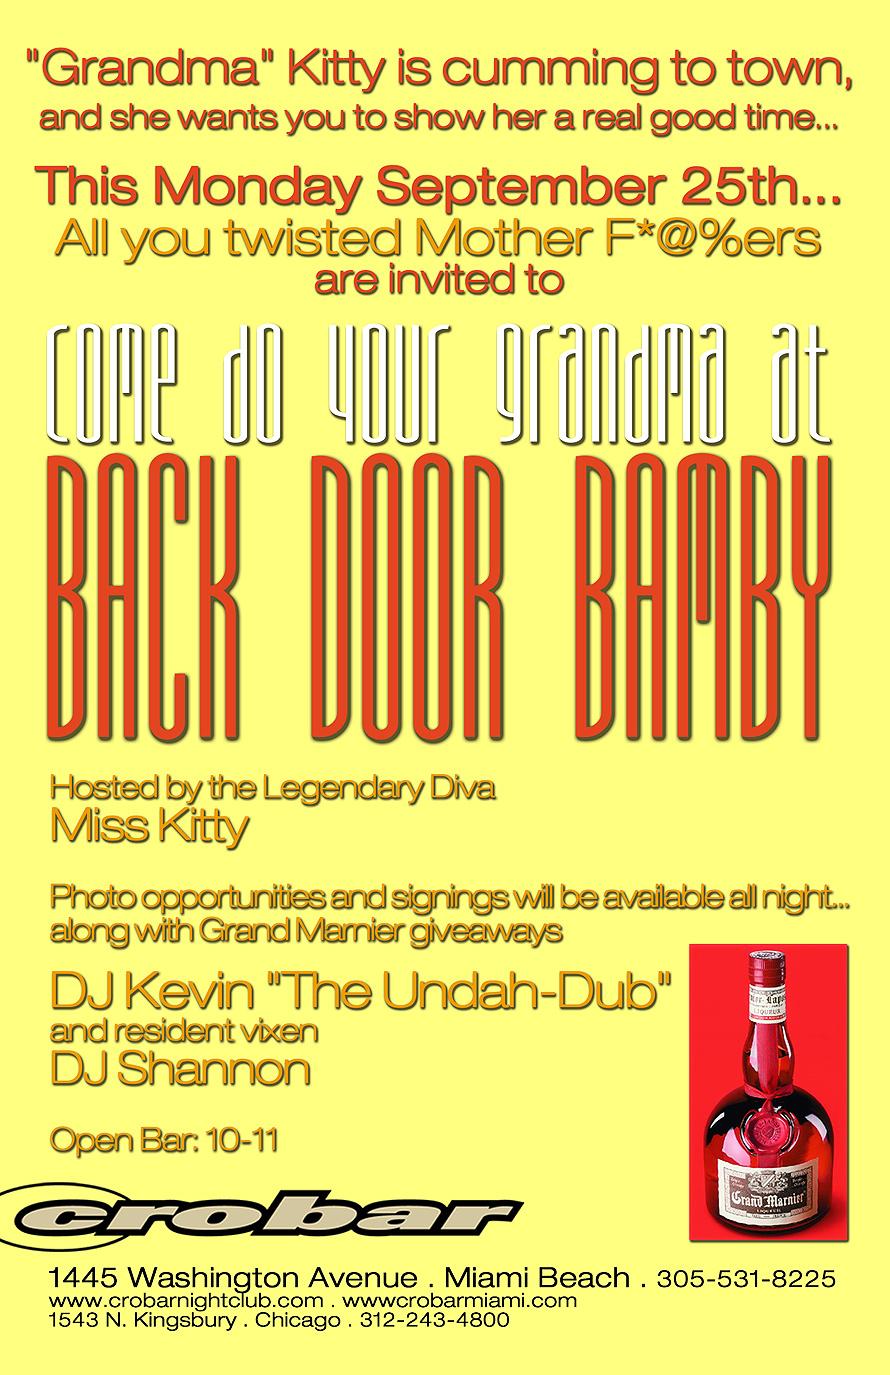 Back Door Bamby Event at Crobar